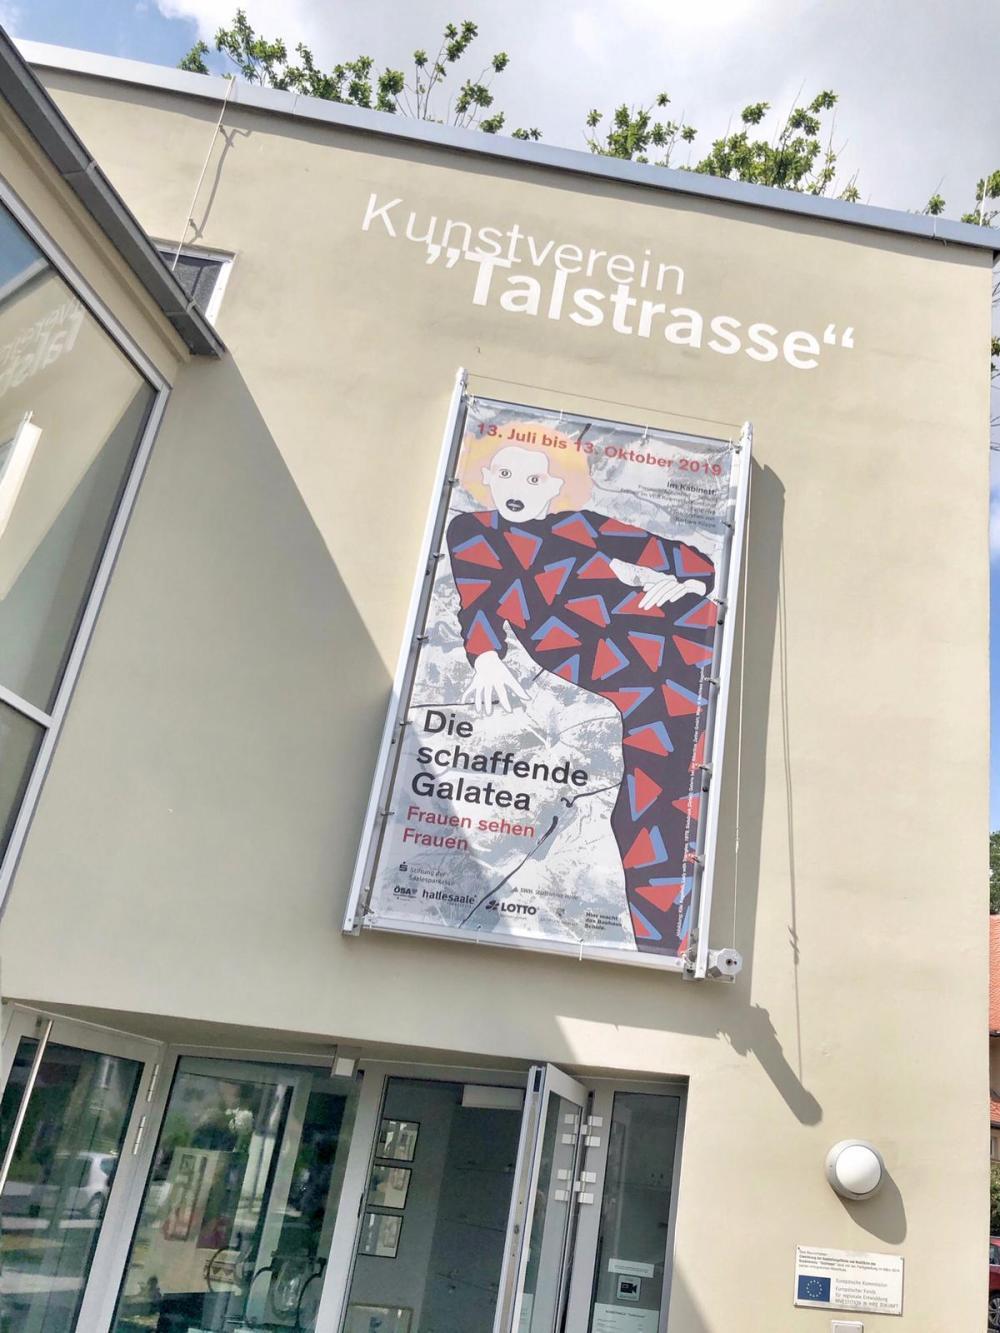 schaffende-galatea-kunstverein-talstraße-female-gaze.blog-4